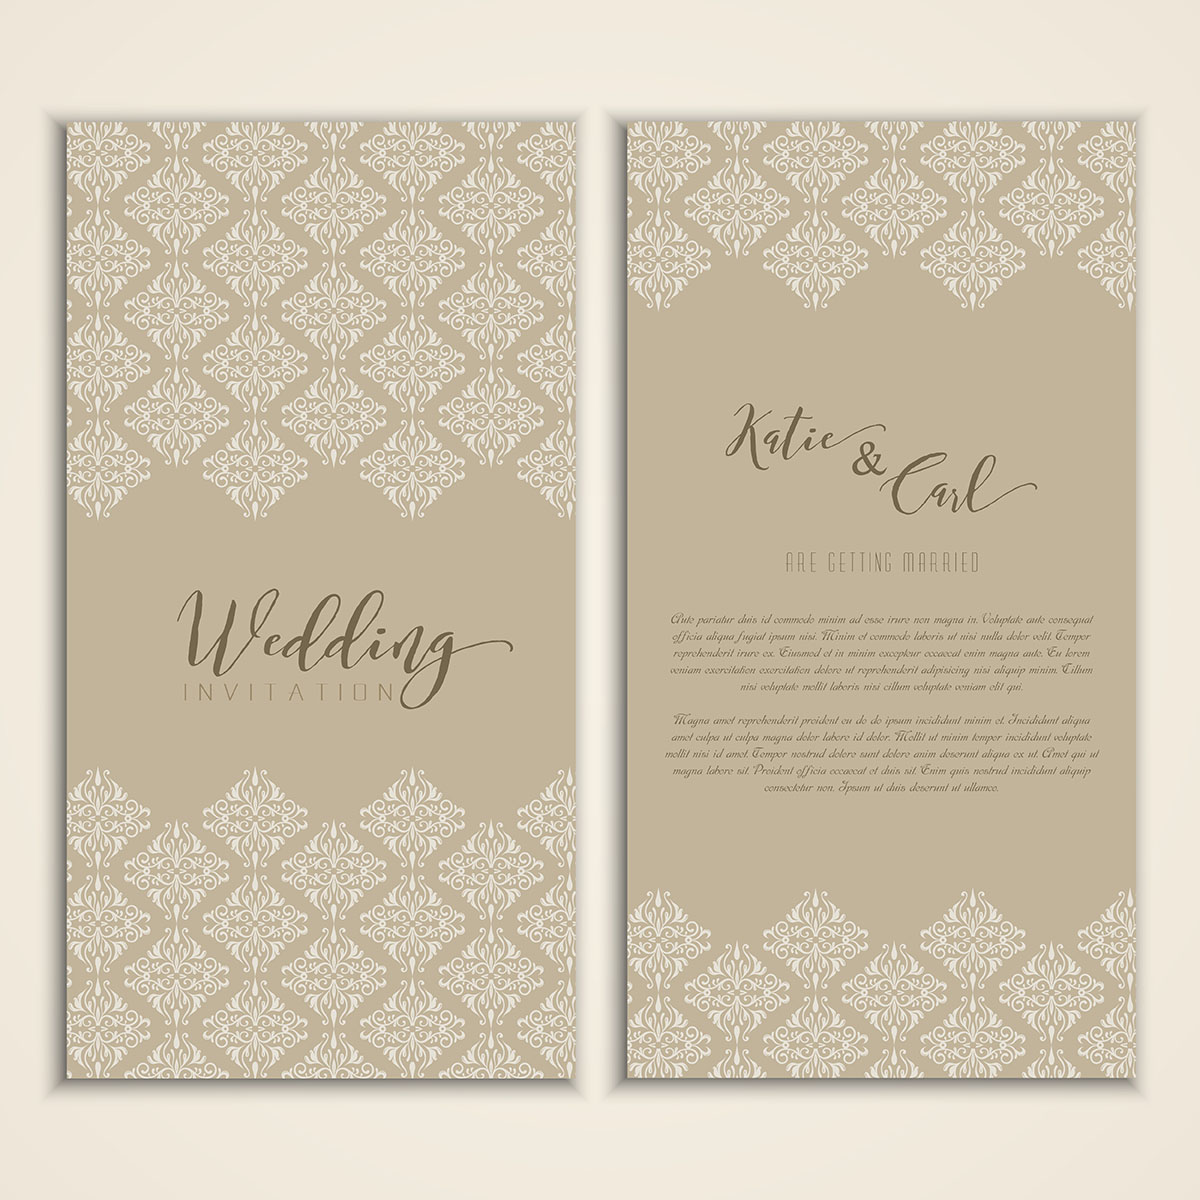 Wedding Borders Free Vector Art - (5799 Free Downloads)